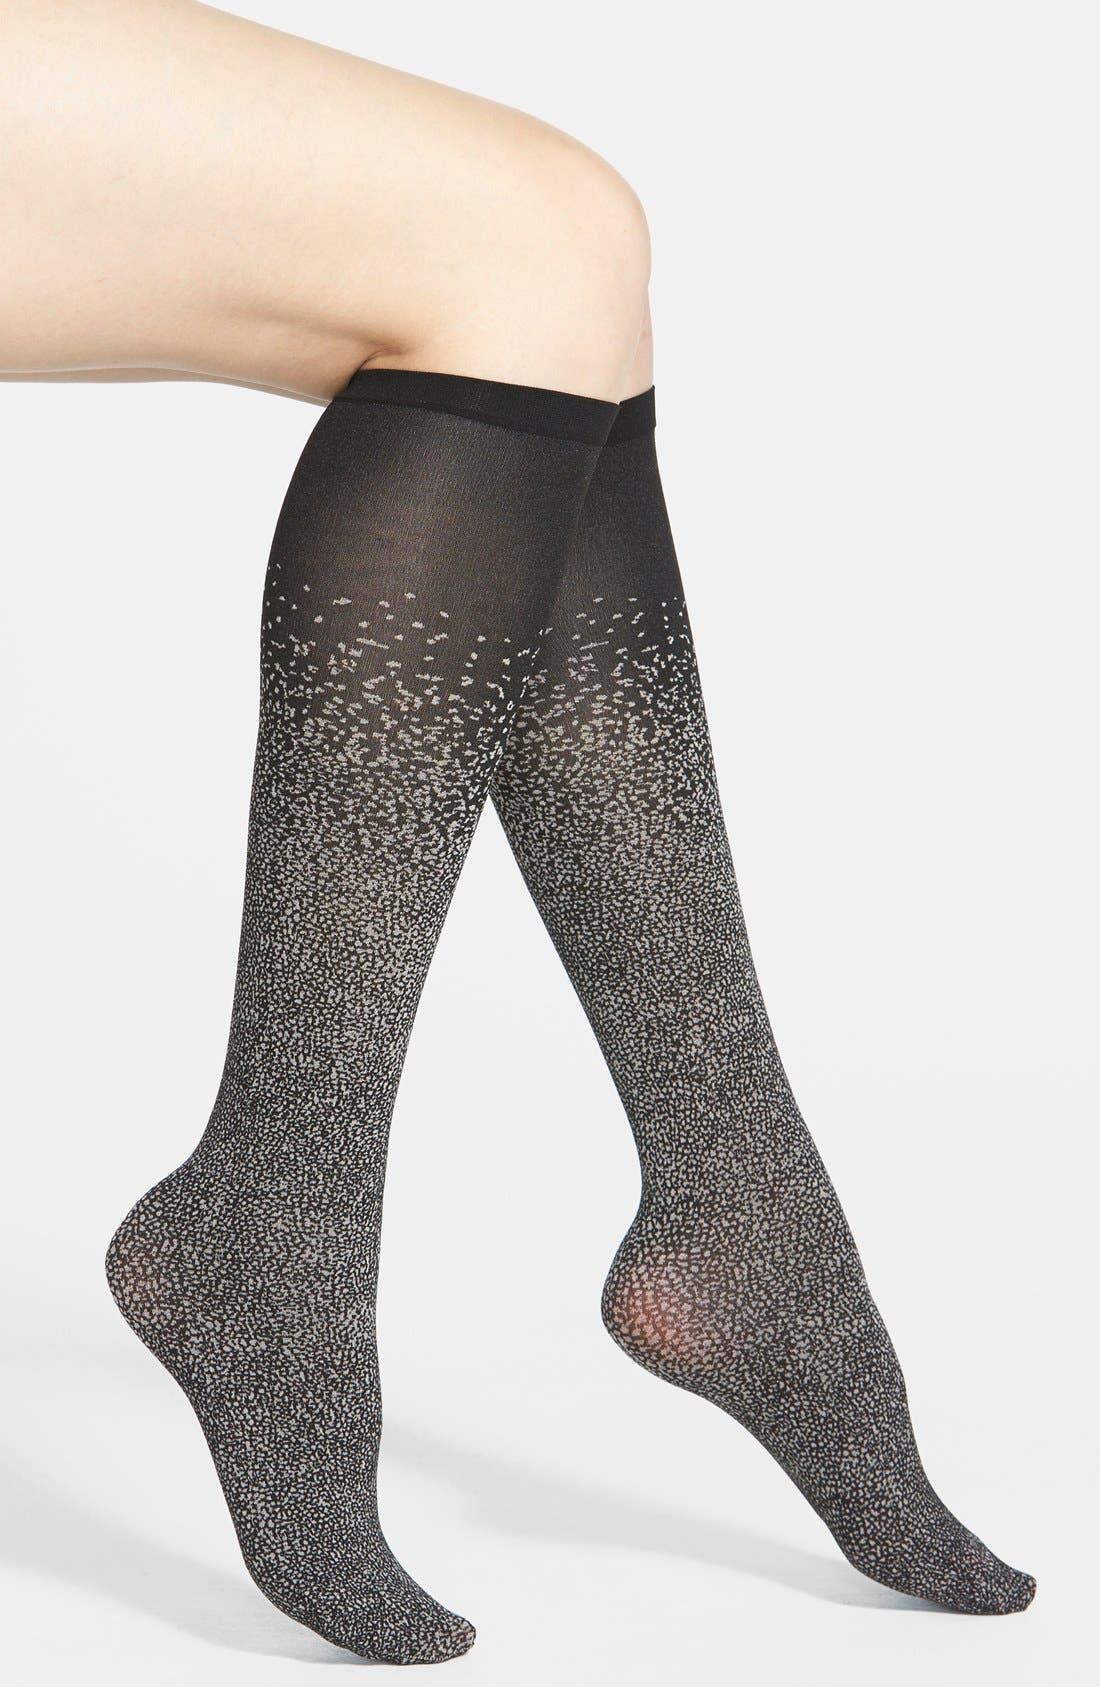 Alternate Image 1 Selected - Oroblu 'Elixer' Knee High Socks